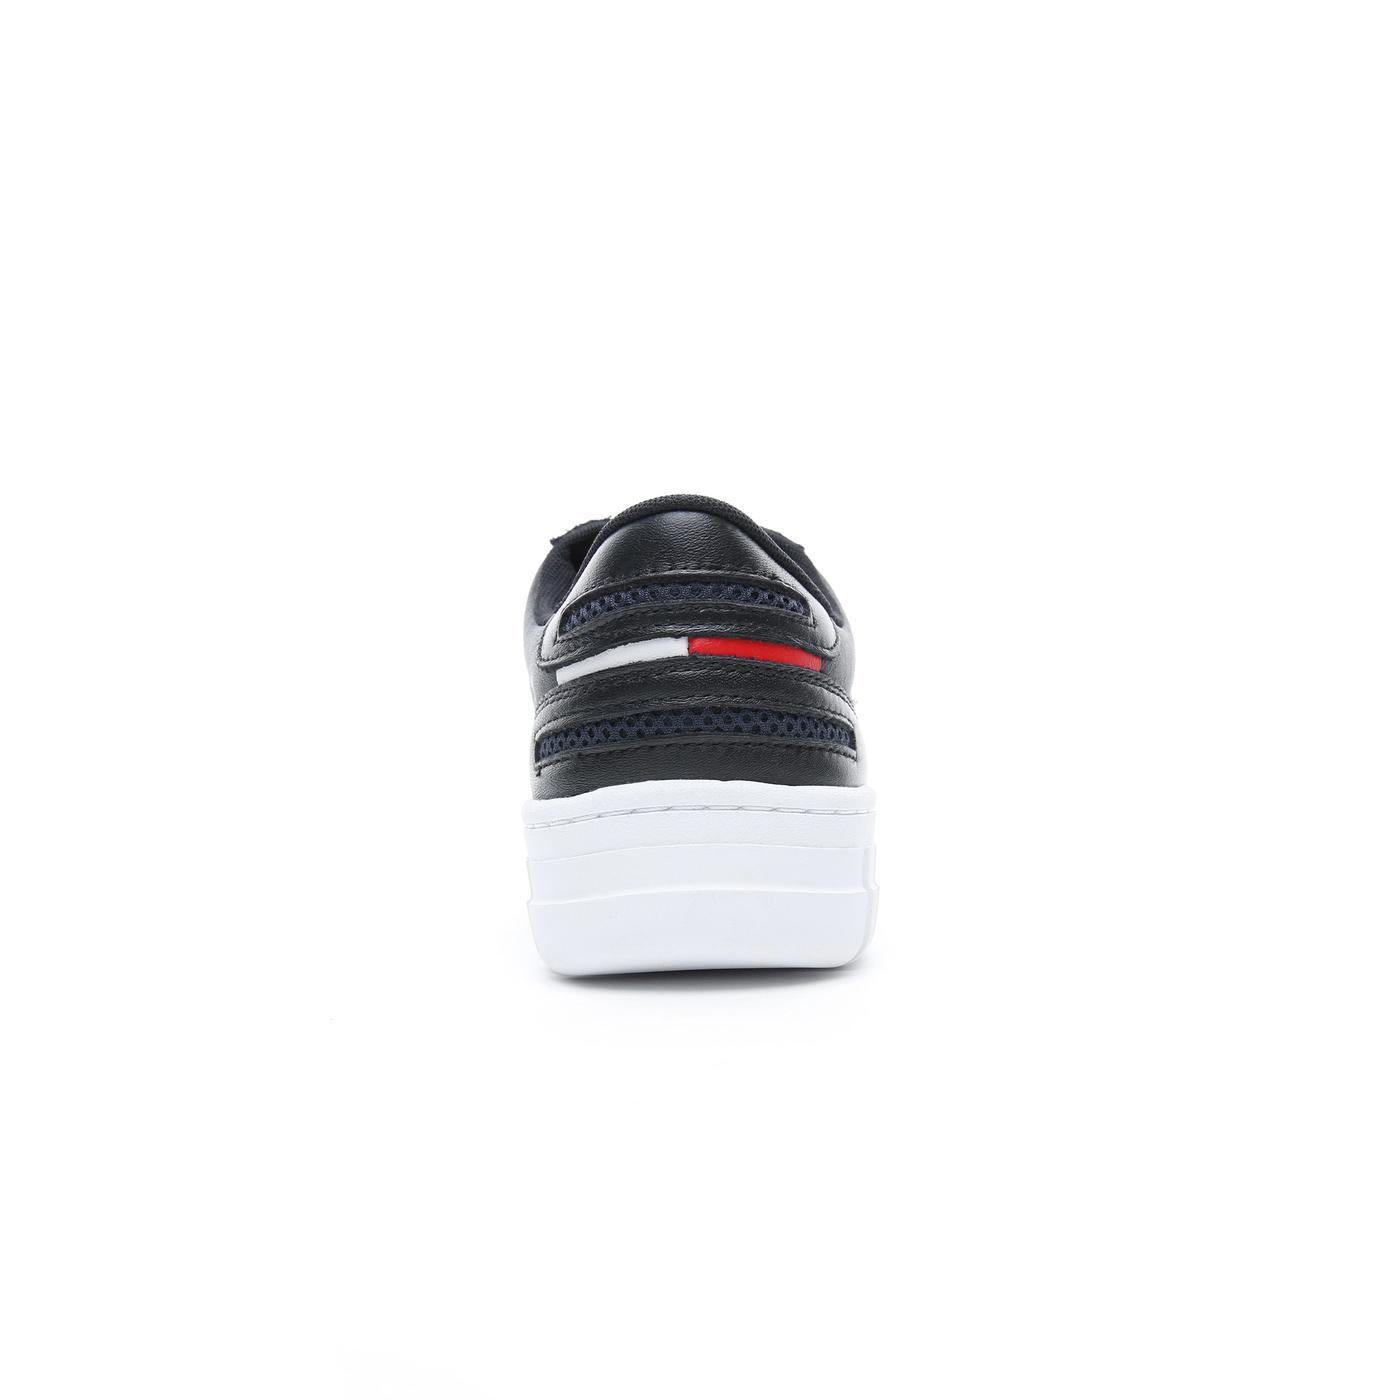 Tommy Hilfiger Essential Retro Erkek Siyah Spor Ayakkabı